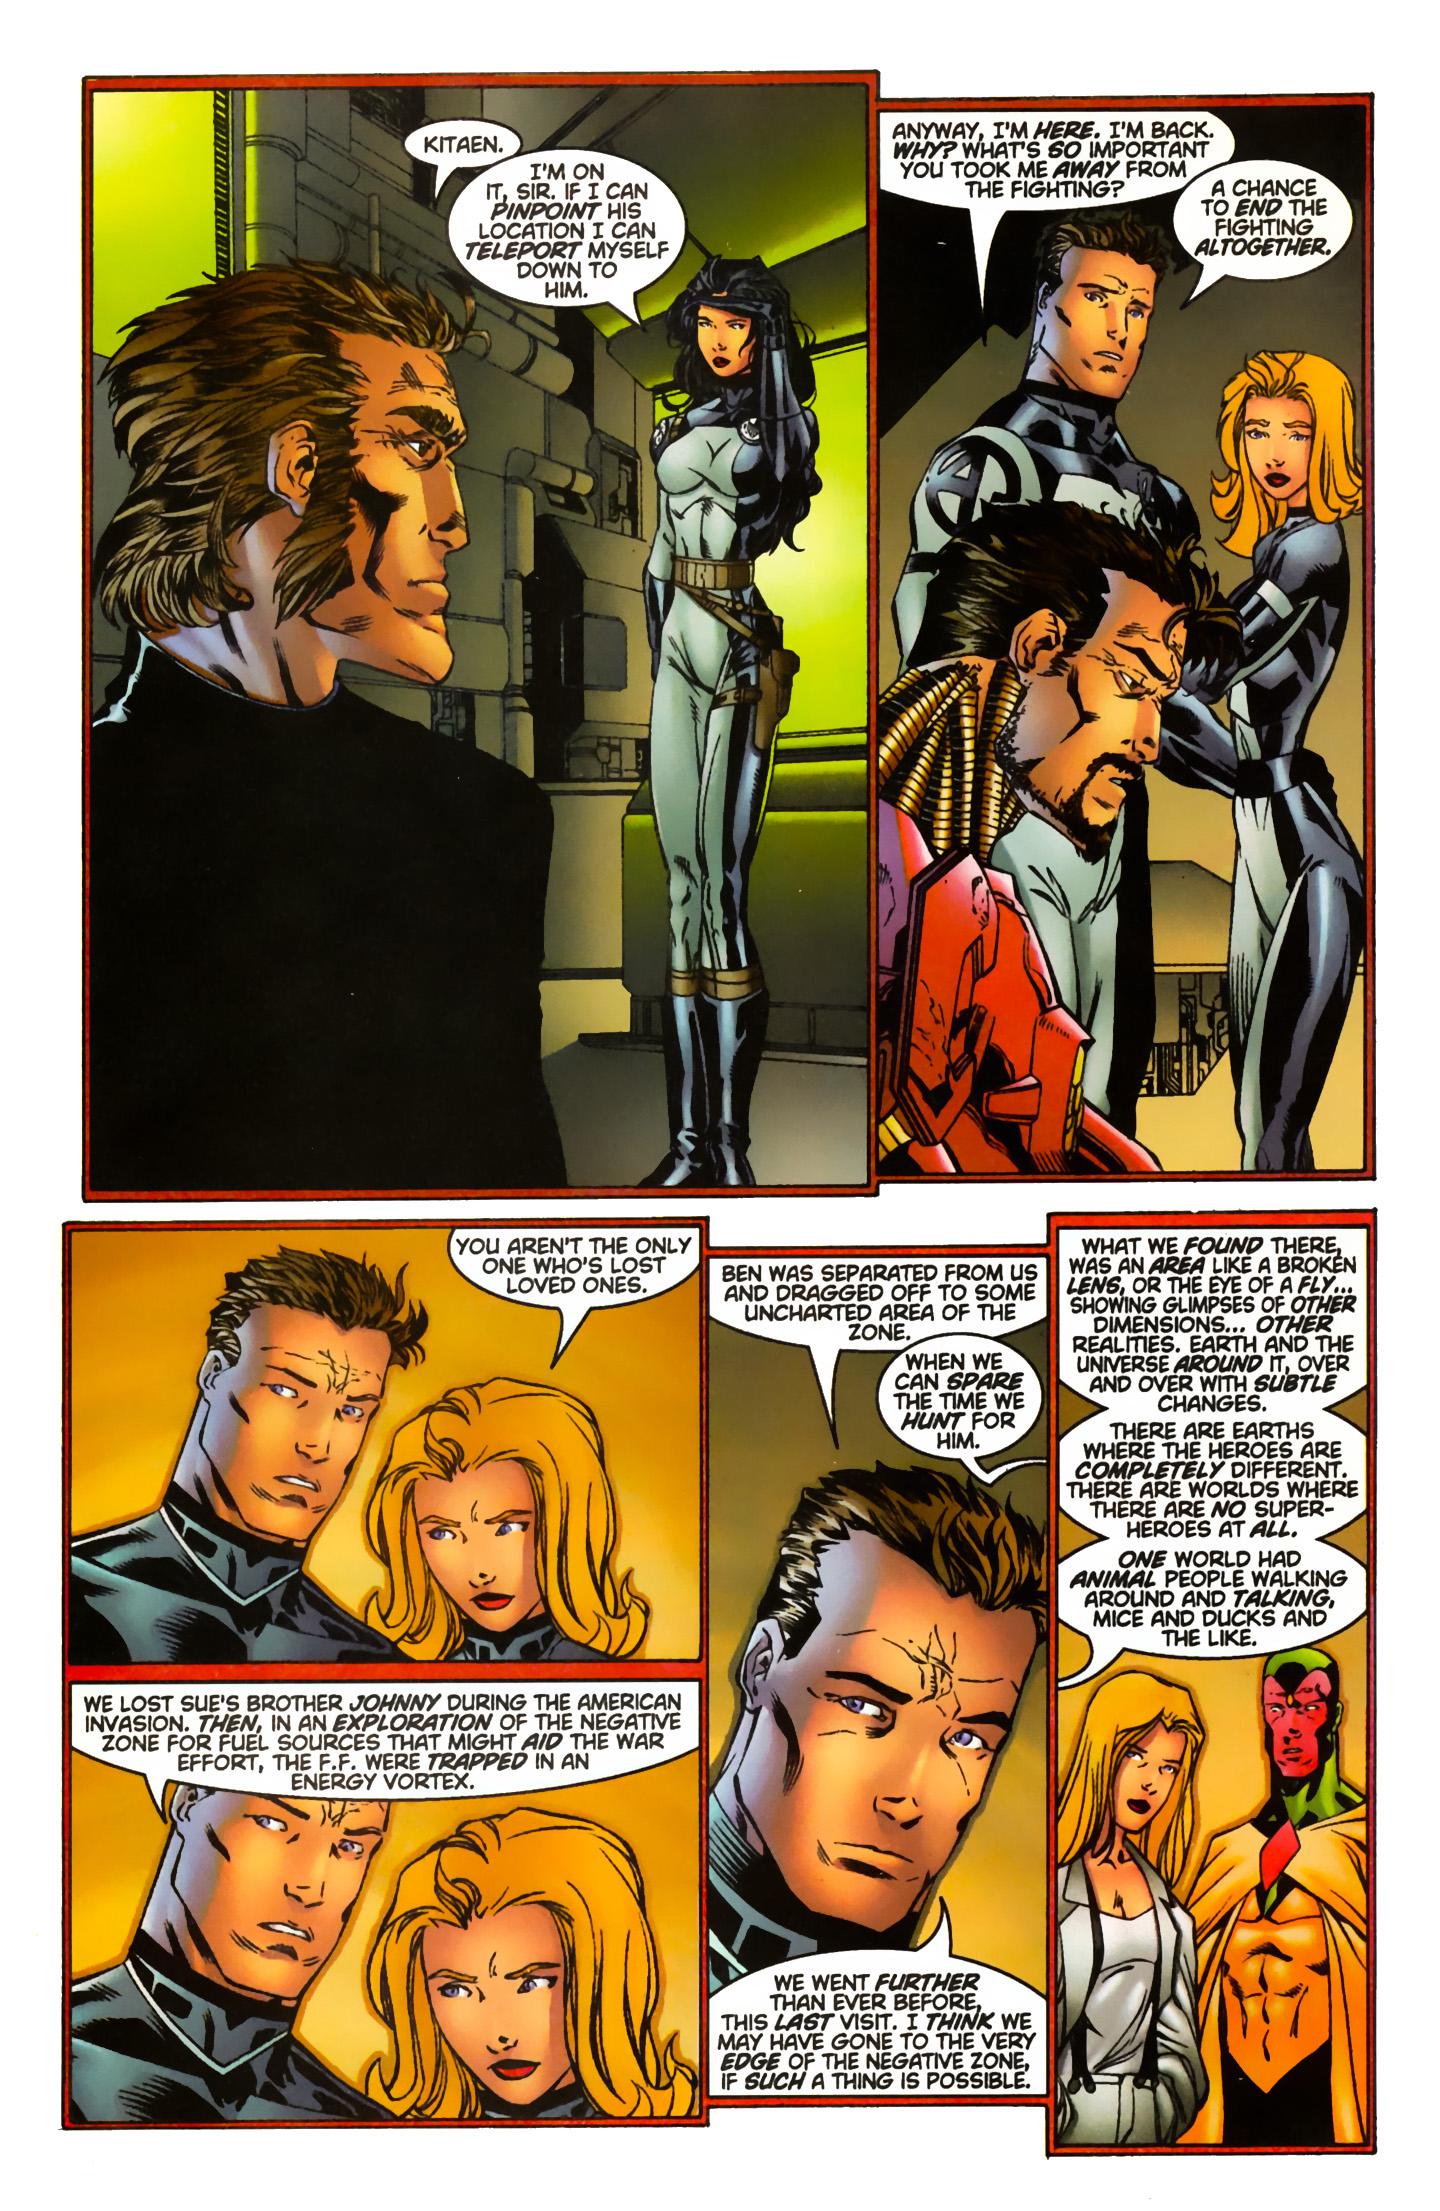 Avengers 1996 Avengers_013_1997_noads_minutemen